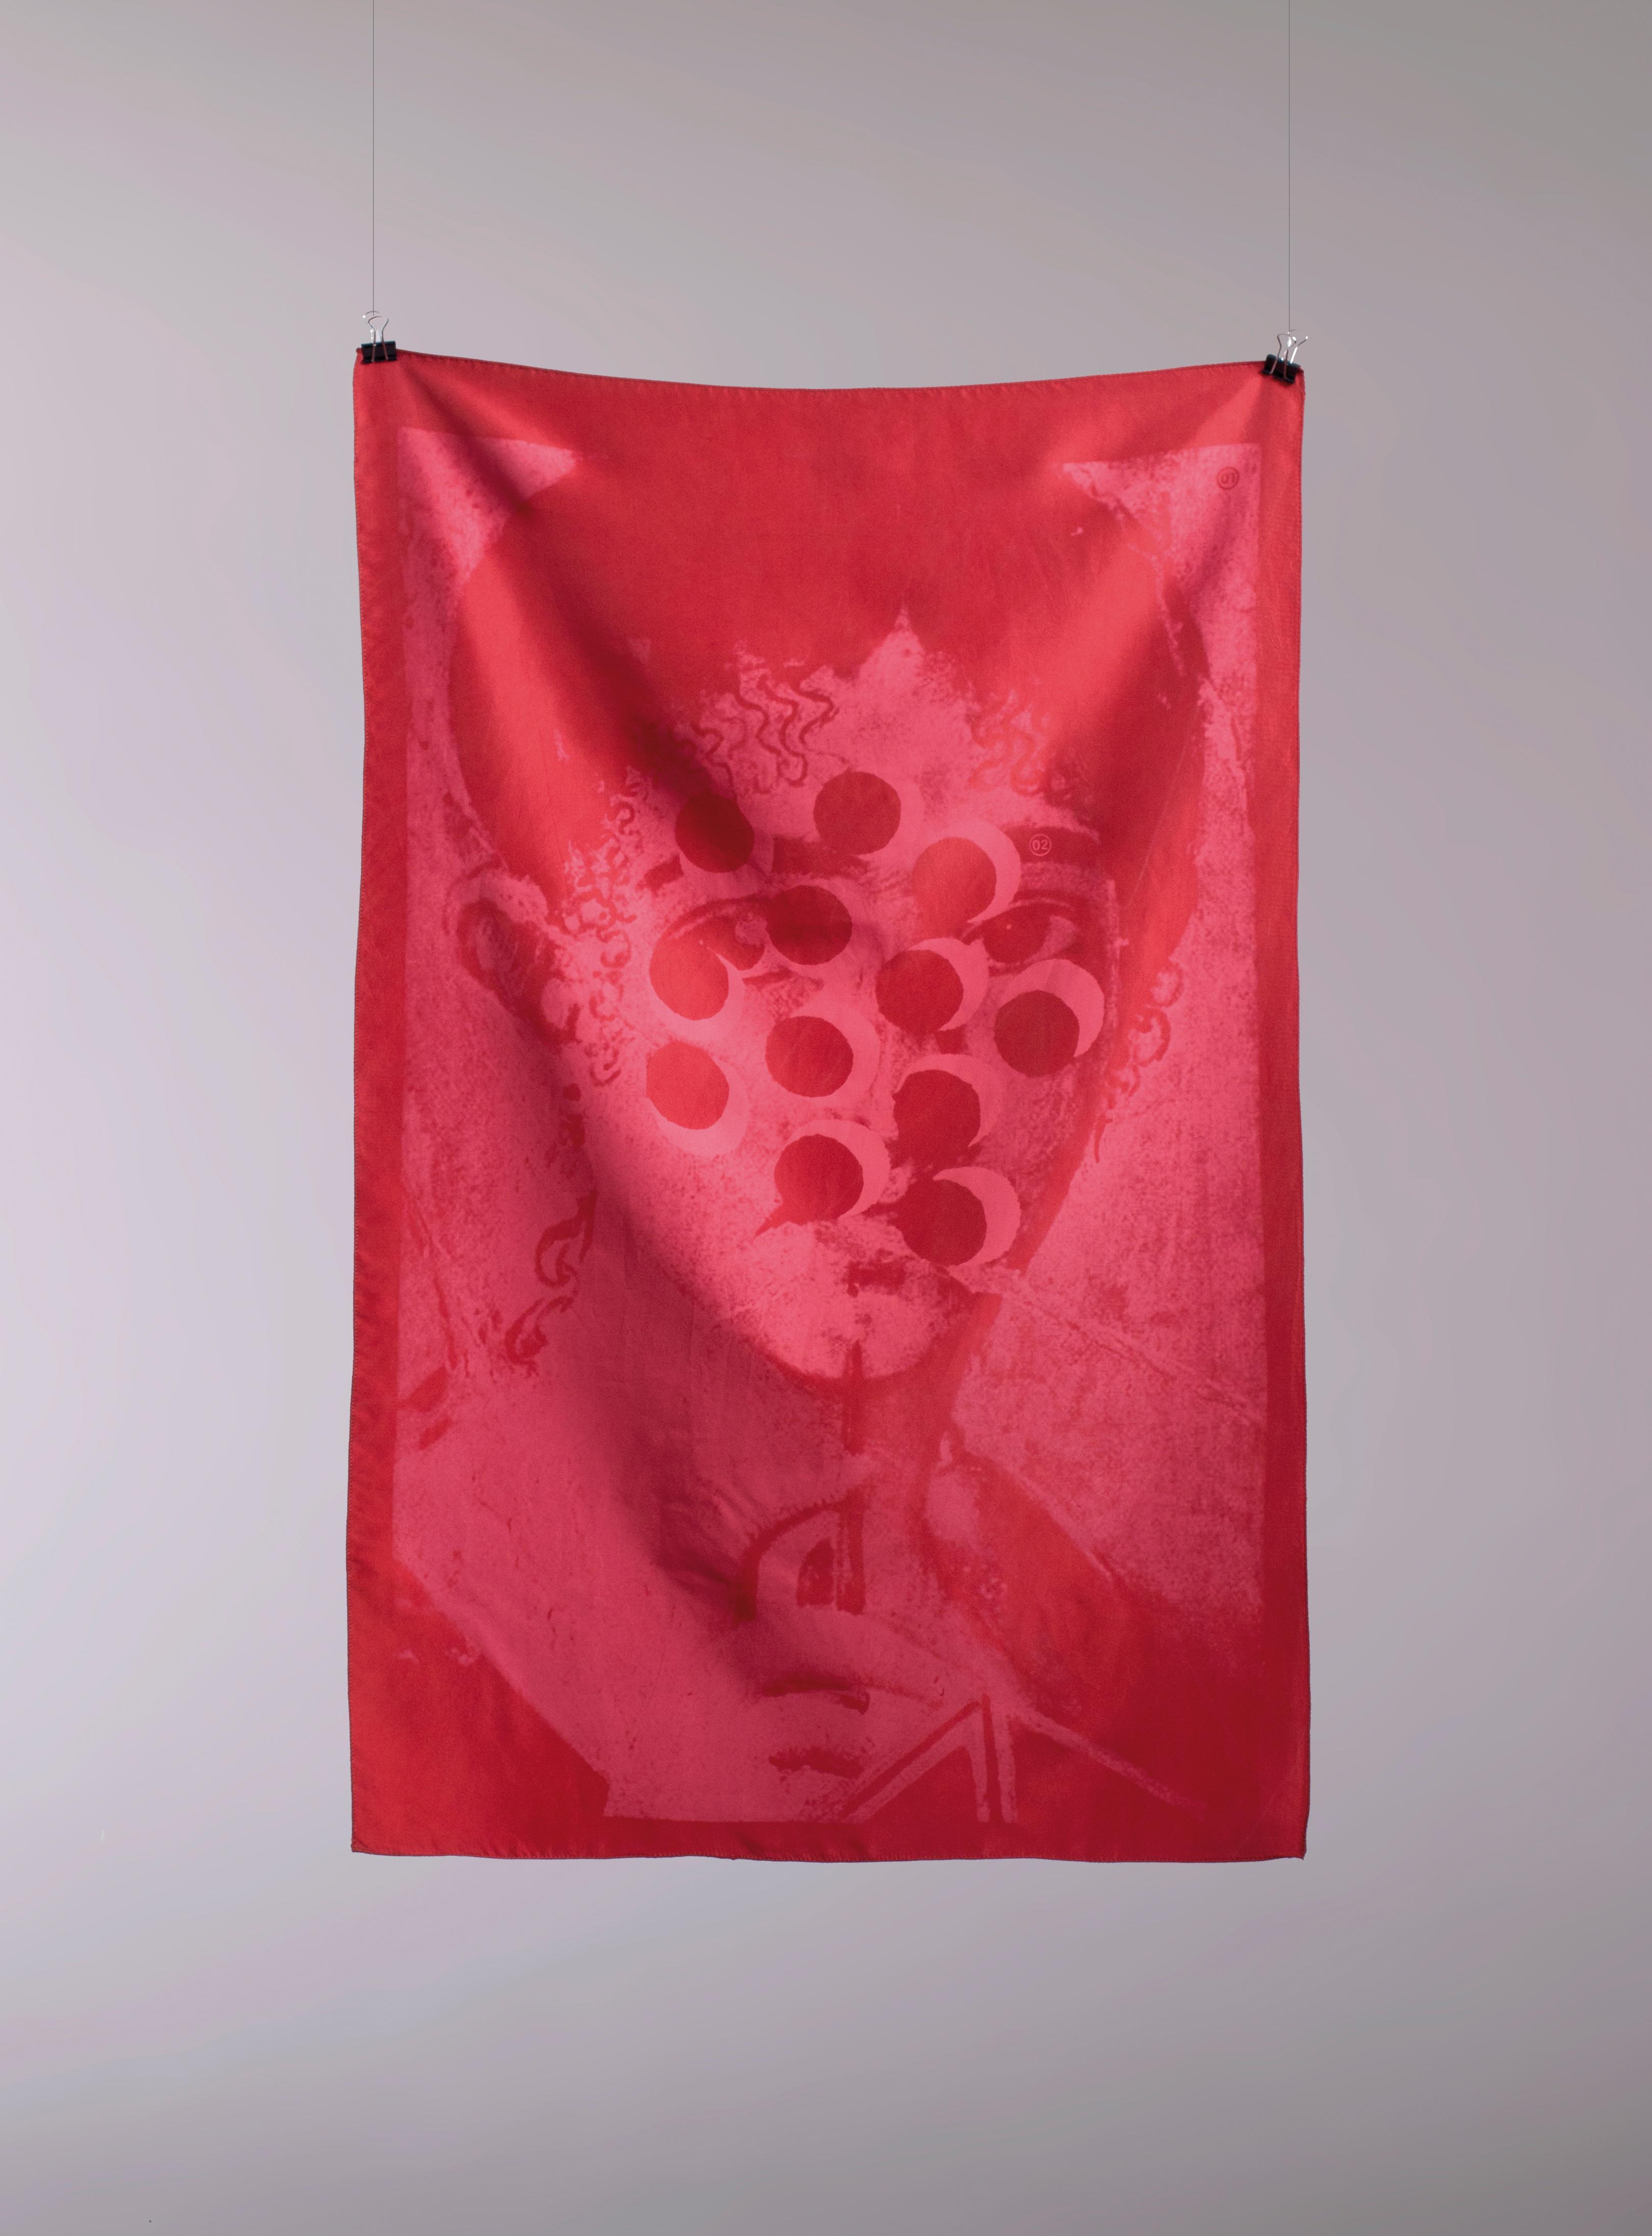 Studio Formafantasma, Turkish Red, per/for Textiel Museum Tilburg, 2013.